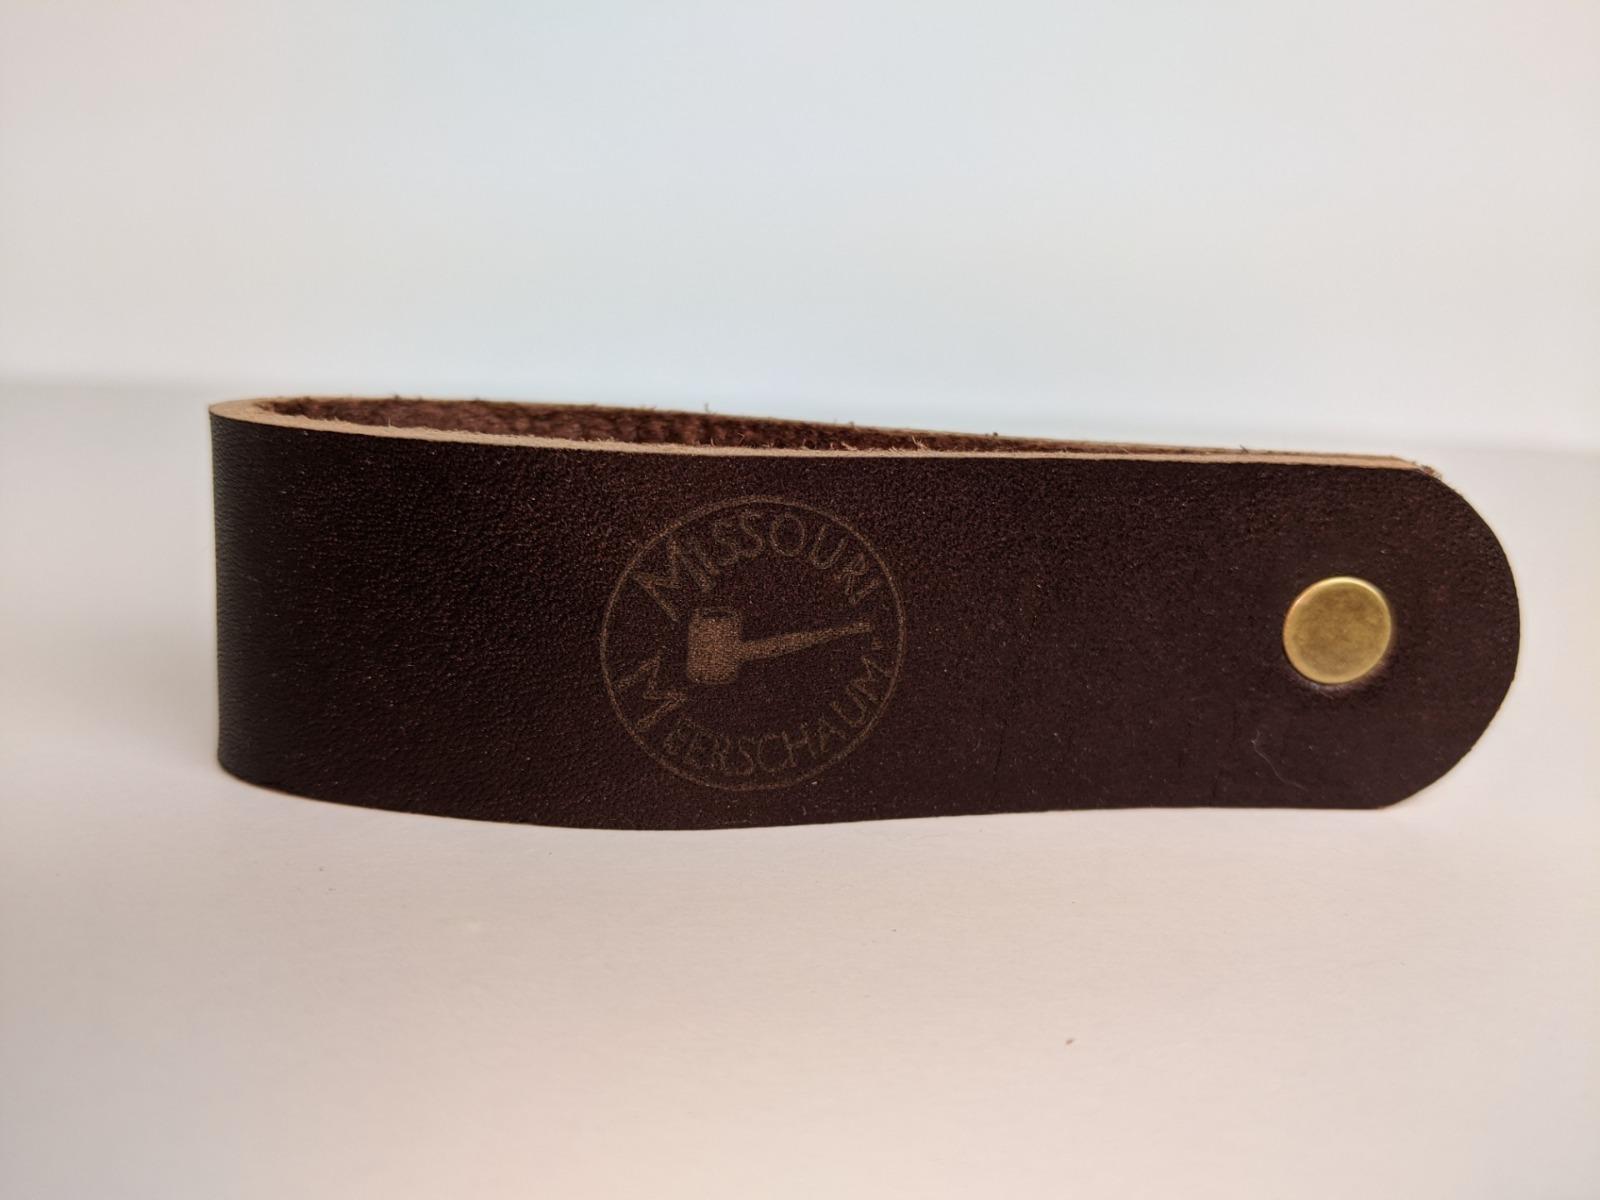 Missouri Meerschaum Leather Pipe Stands-550175